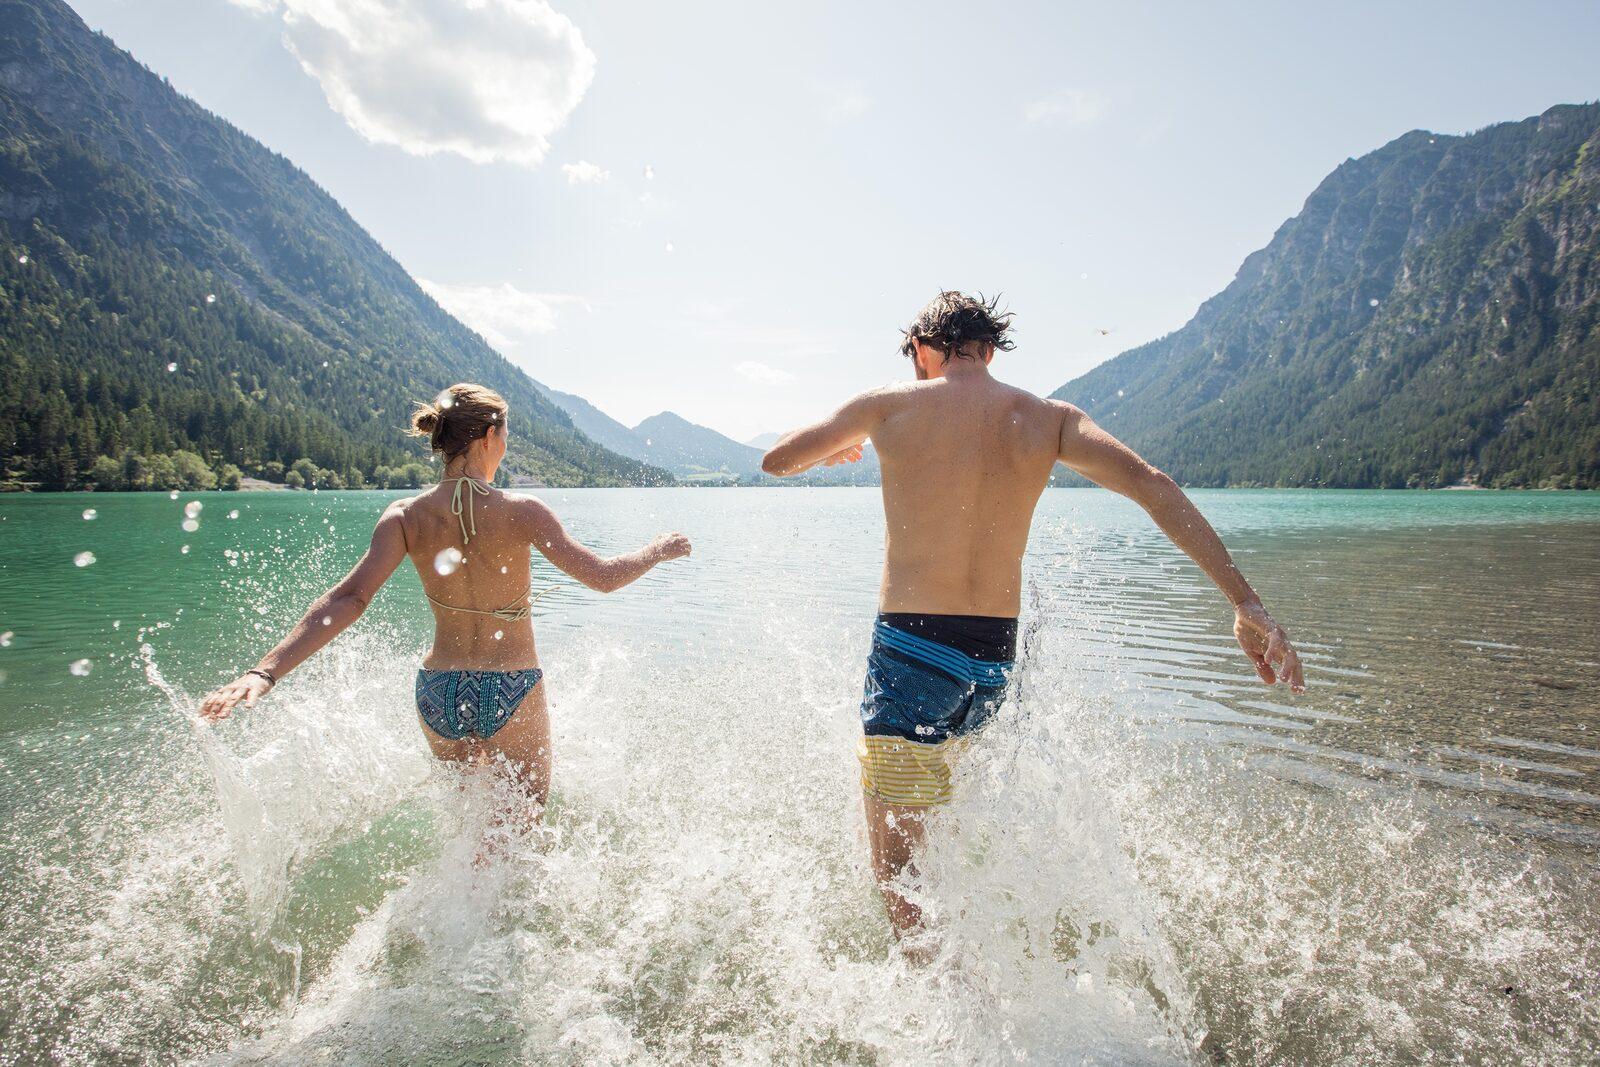 Schwimmen & Bergseen bei Ehrwald